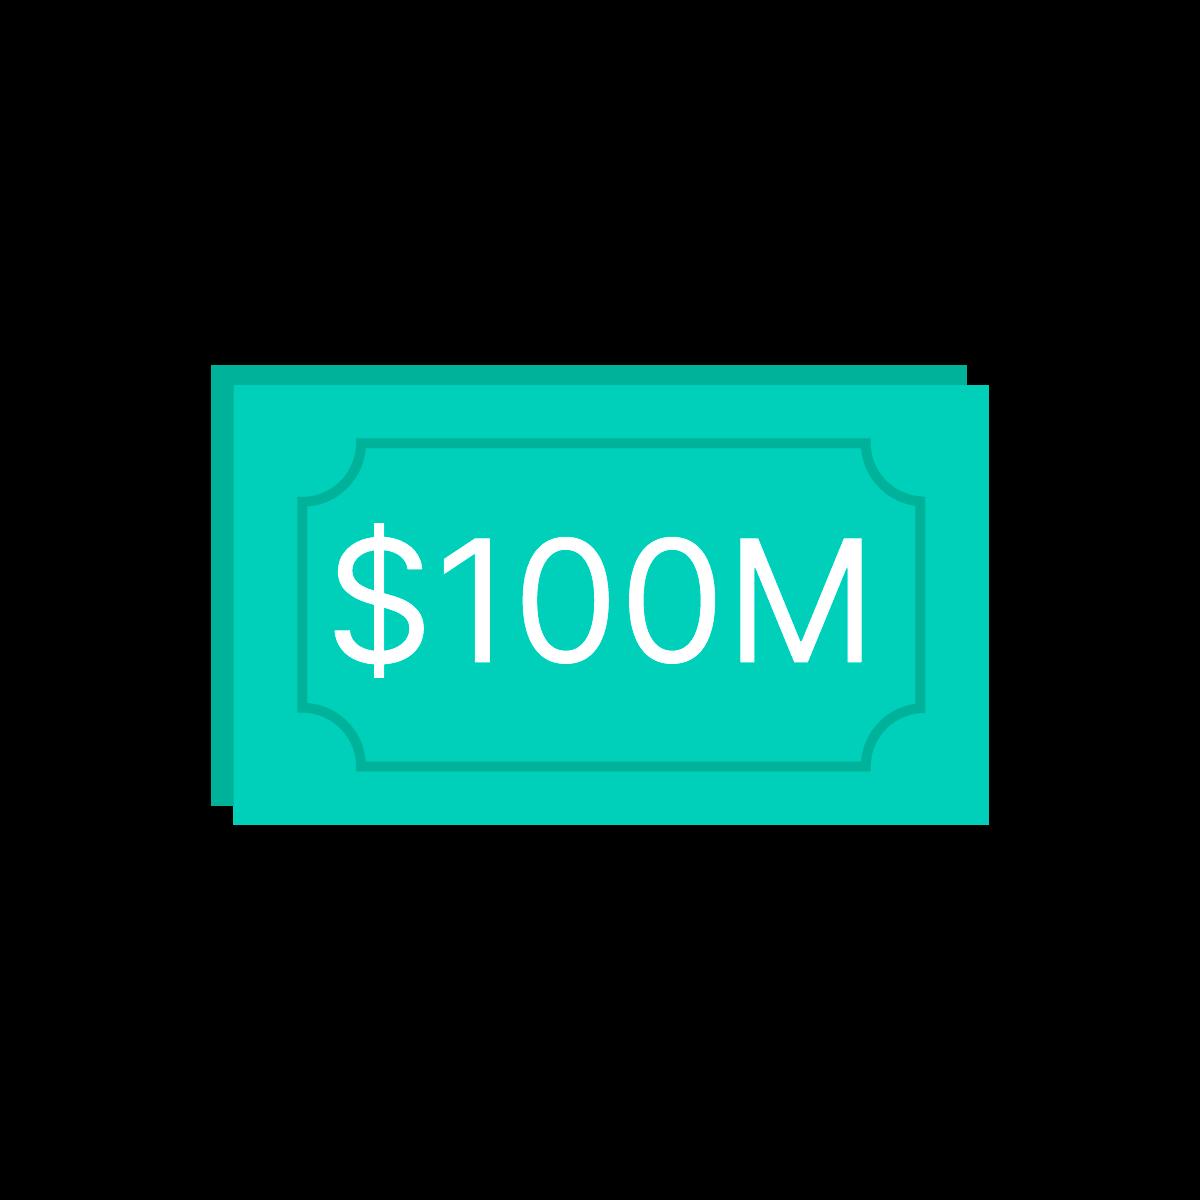 Icon of $100 million cash